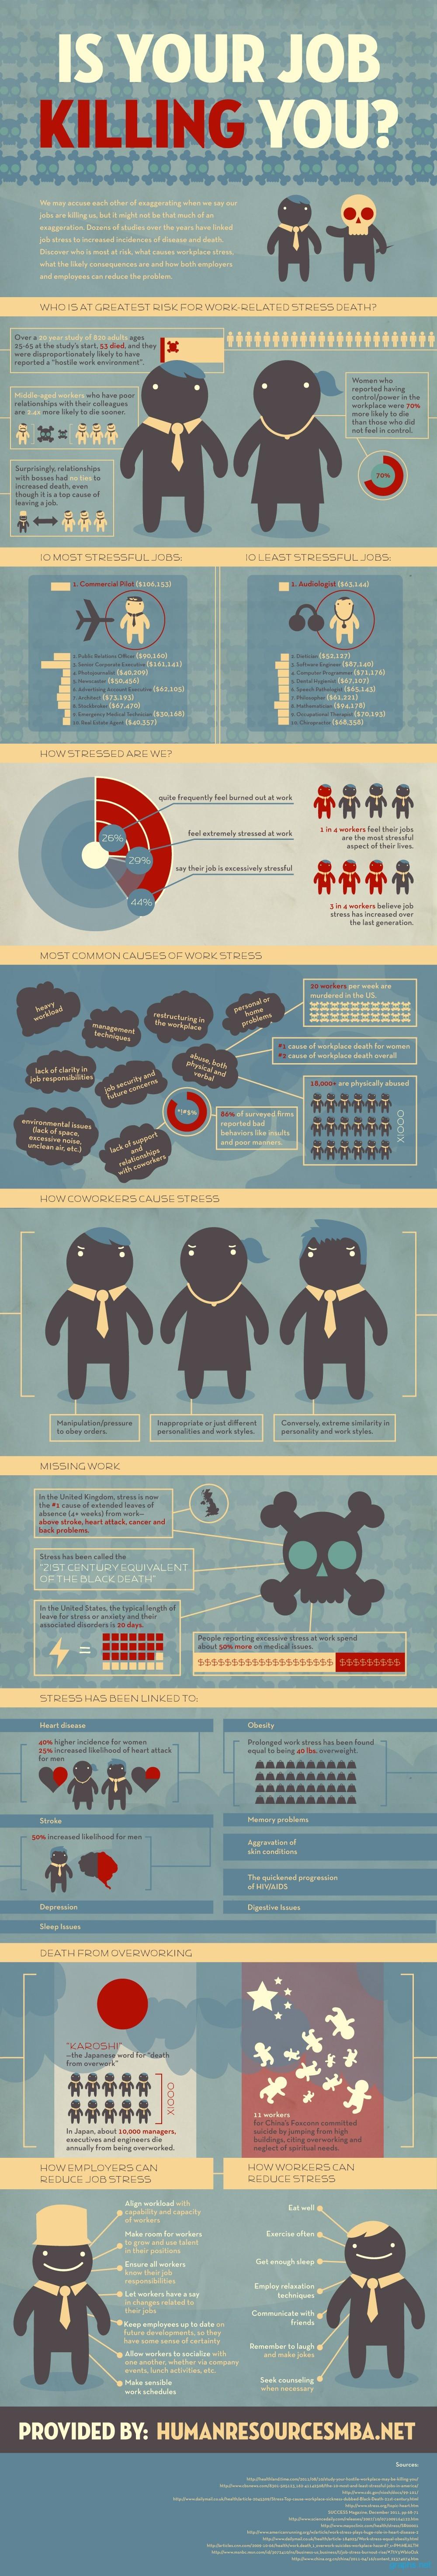 risk factor job stress